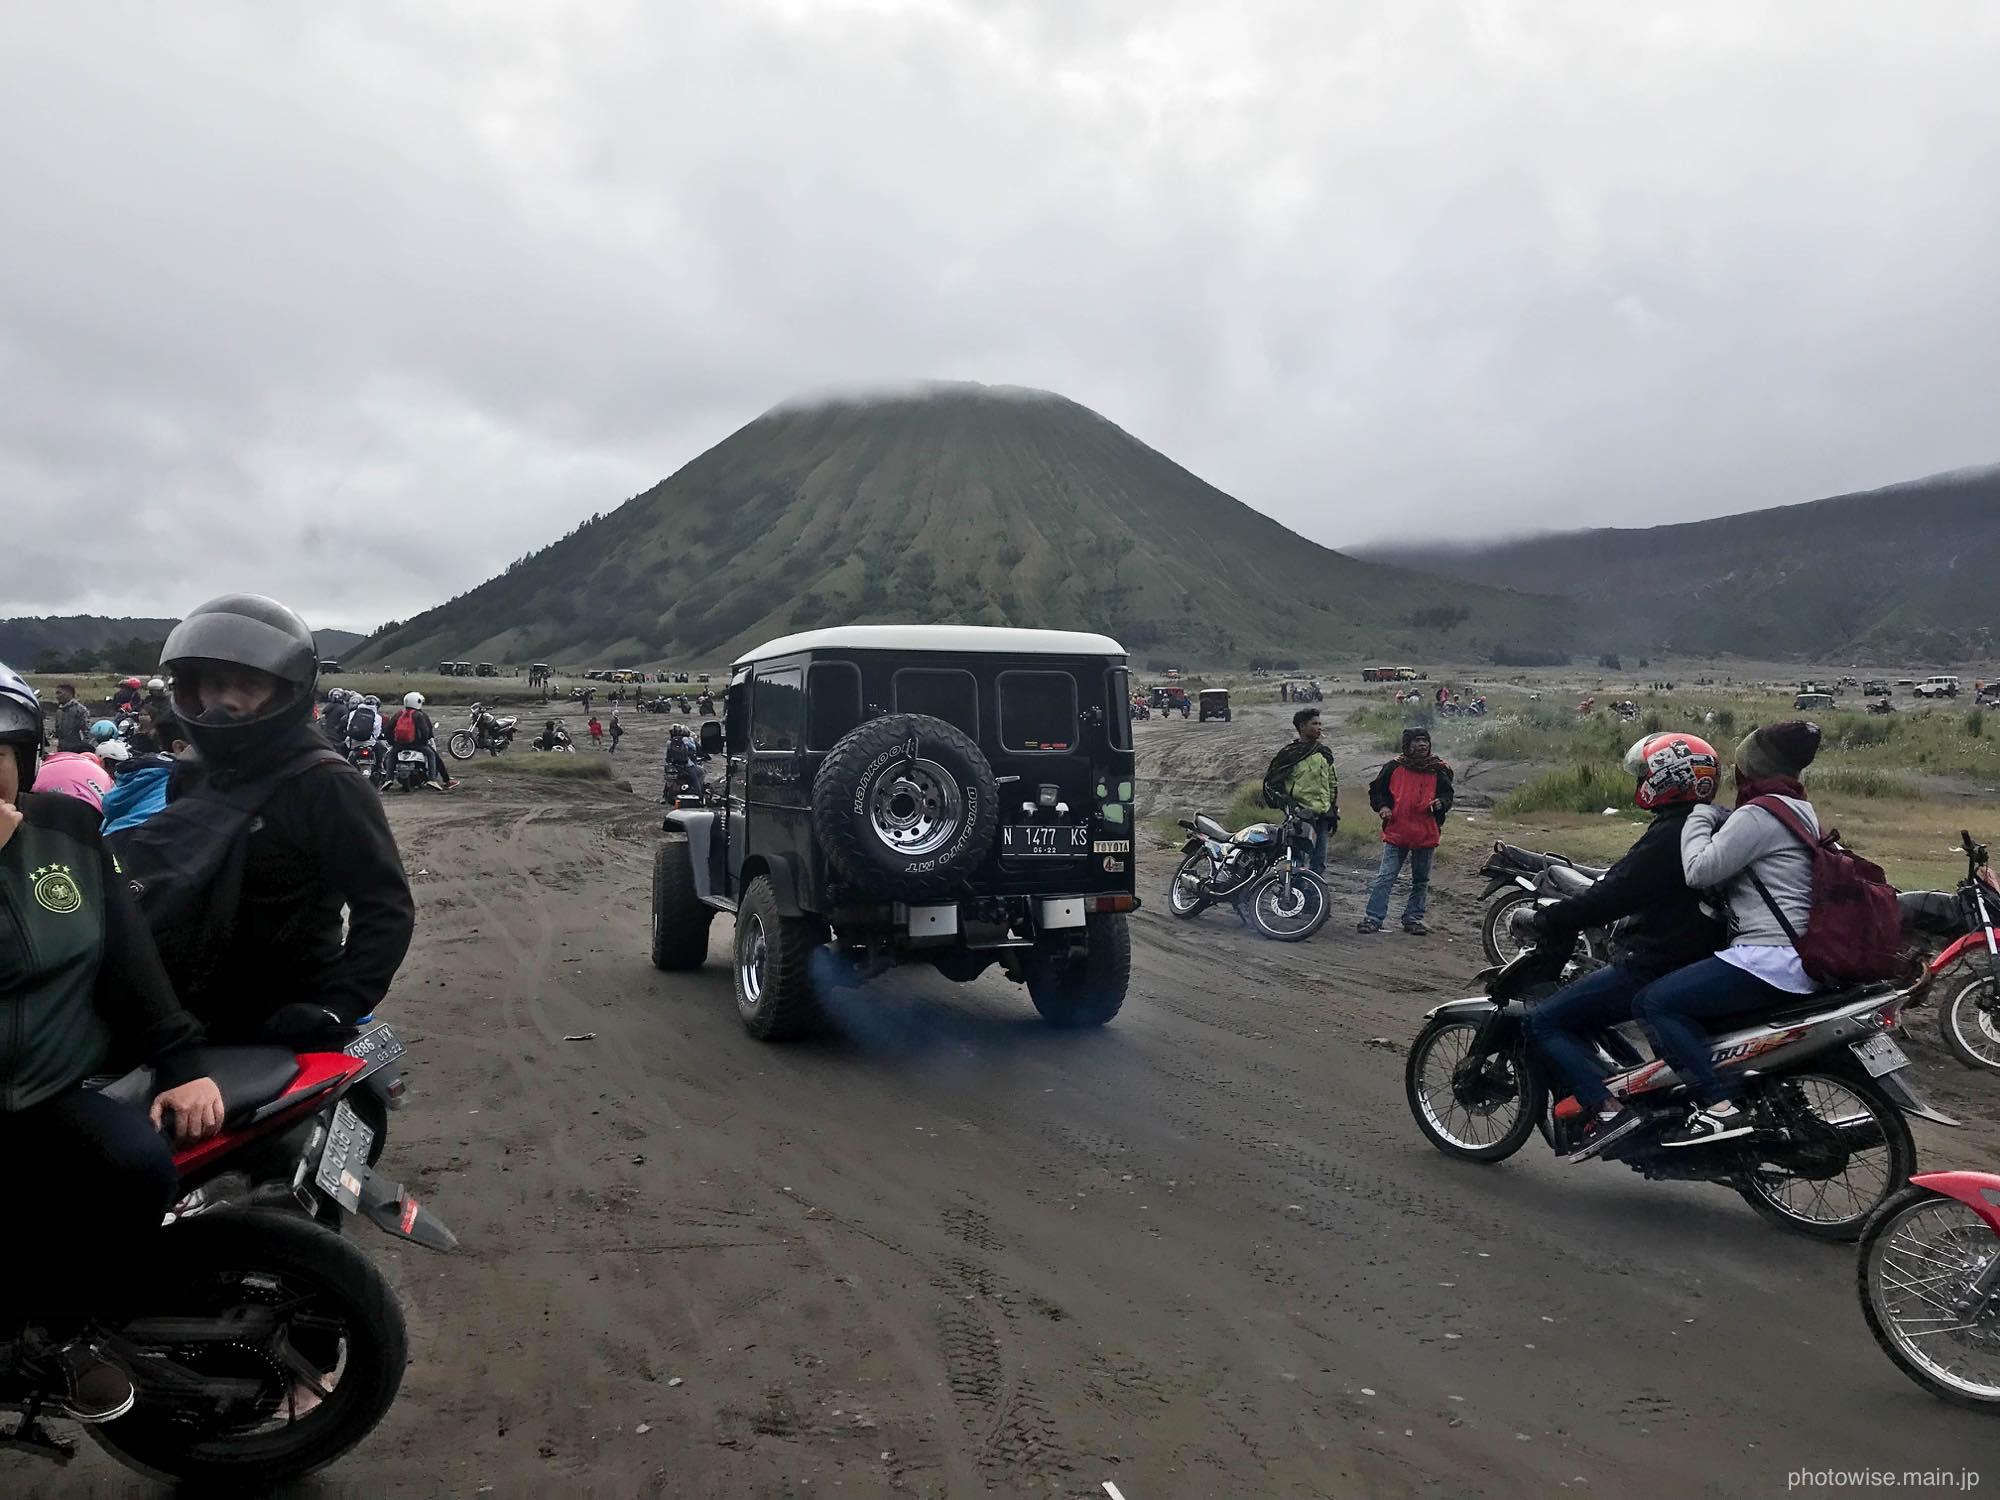 jeepandbike